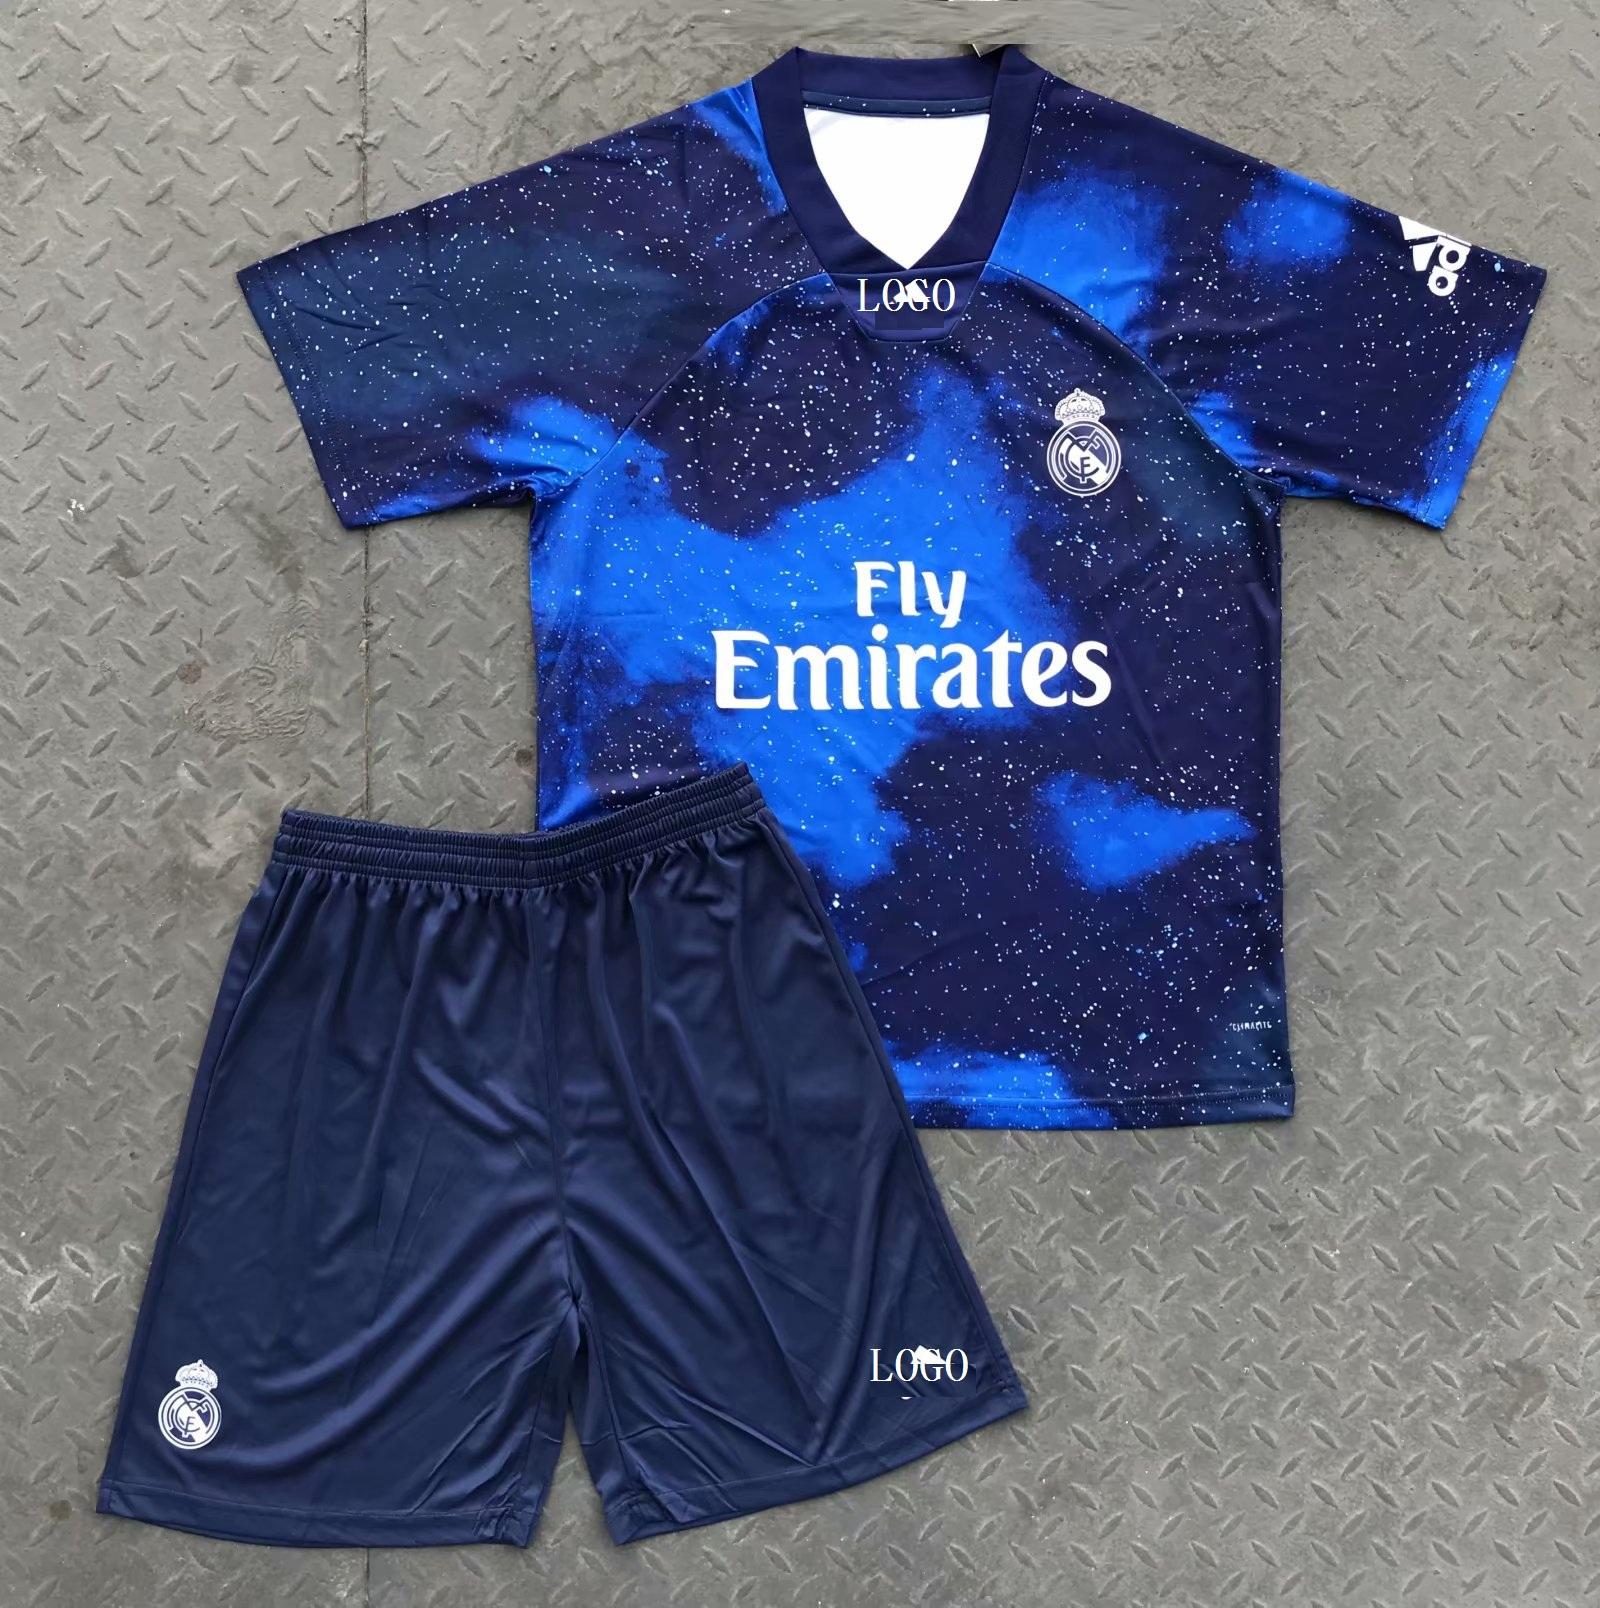 super popular 059a8 9afea 2018/19 AAA Adult Real Madrid EA Sports Soccer Uniforms Men Football Kits